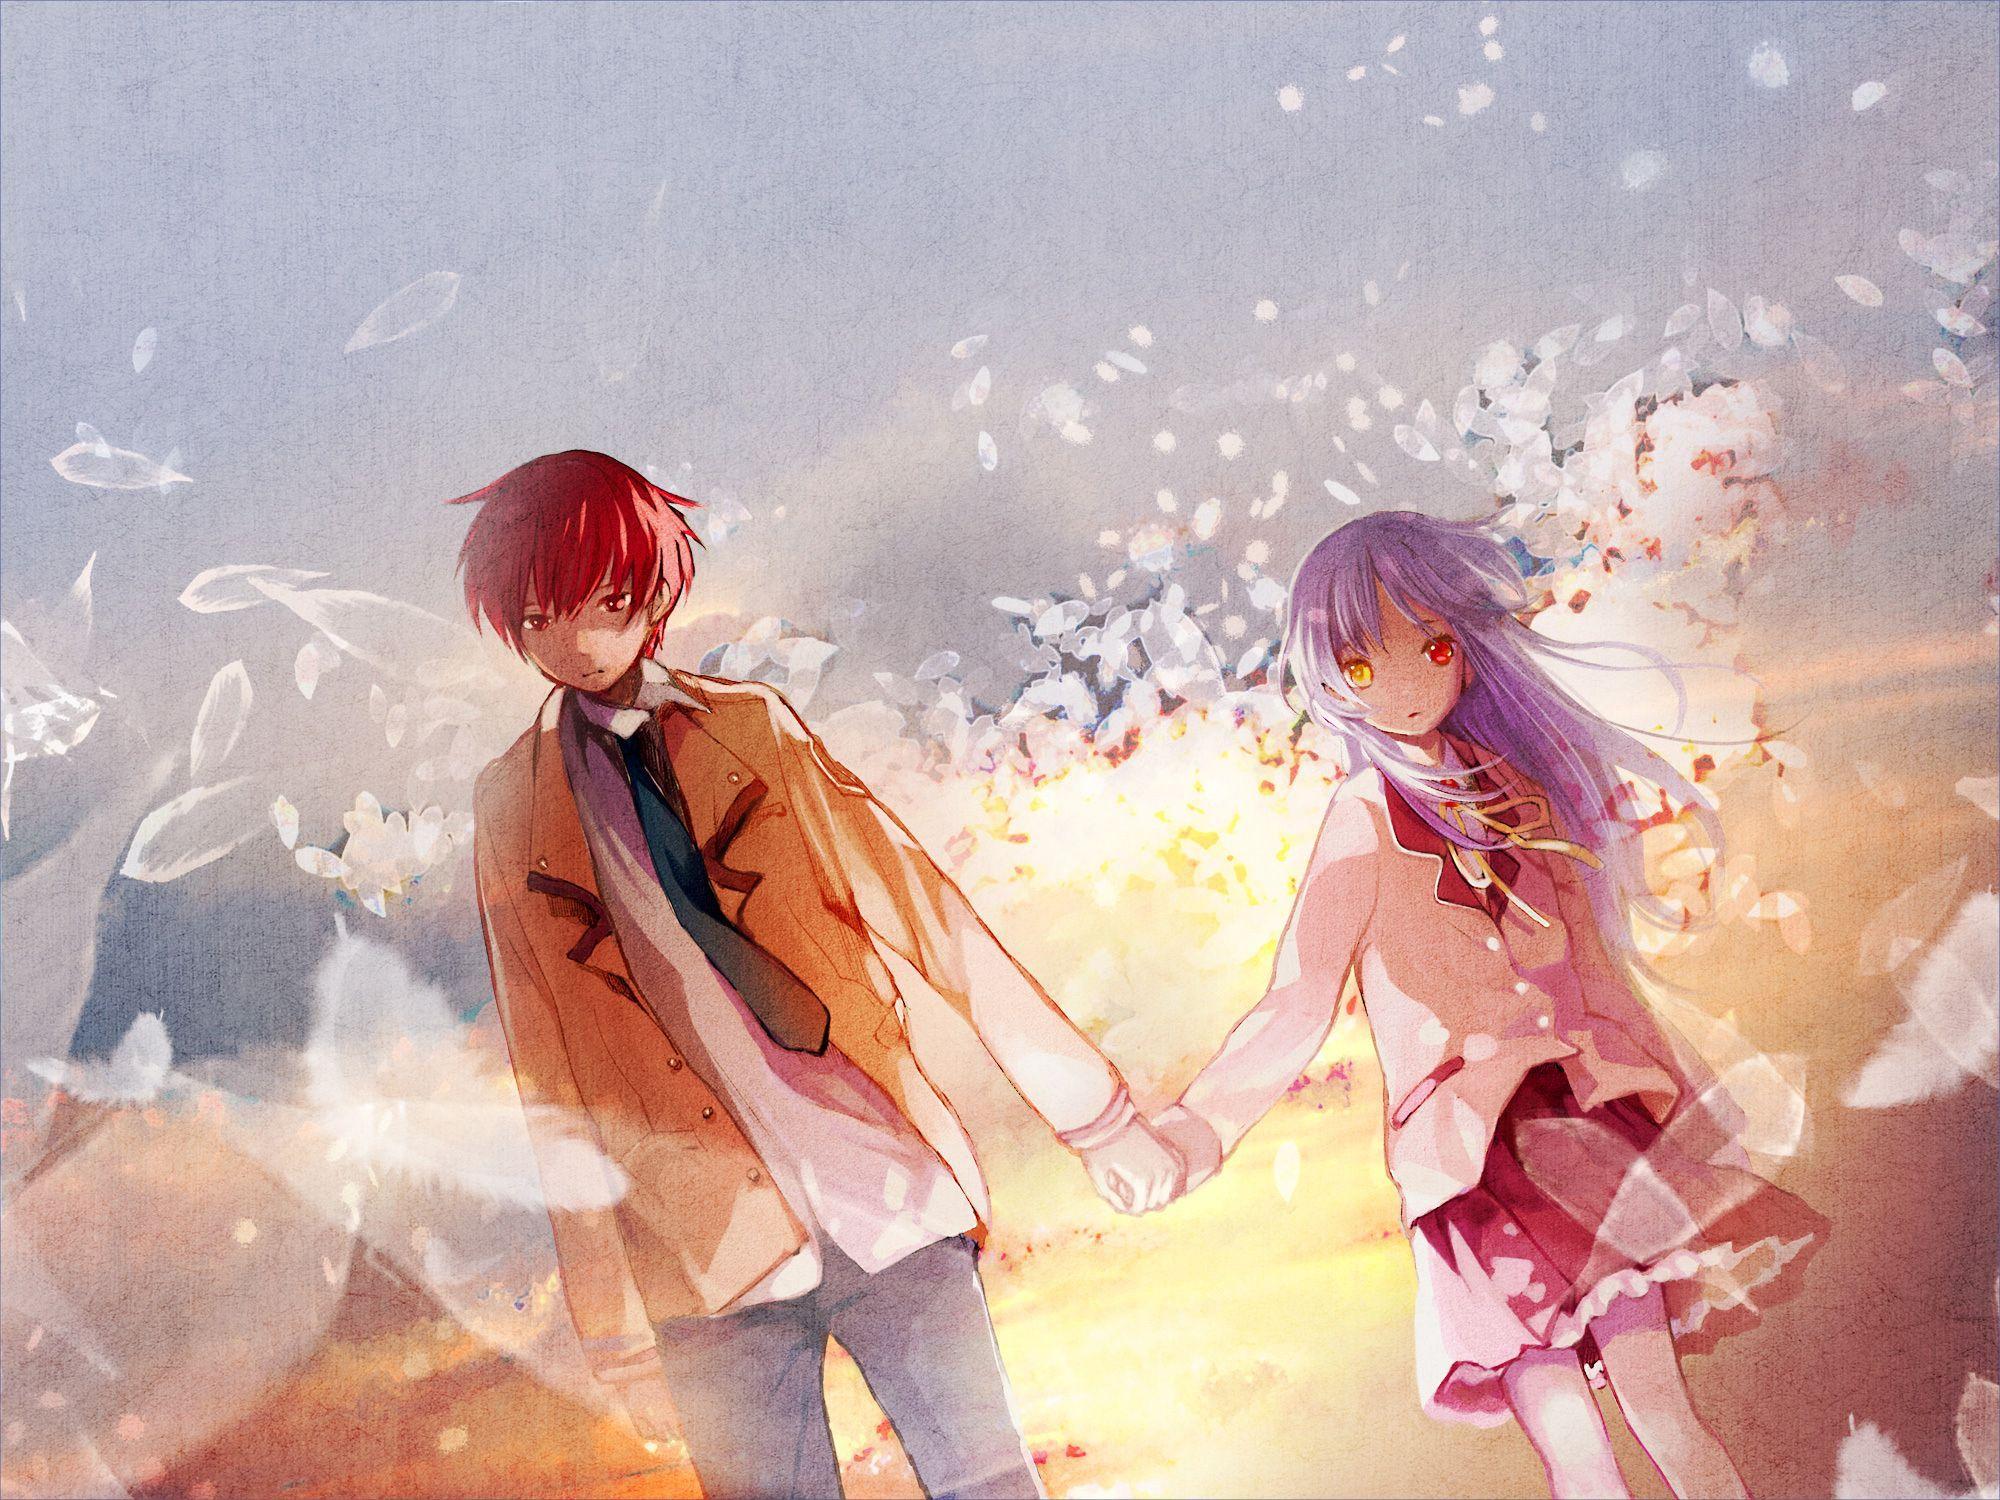 Anime Romance Wallpaper X Id Wallpapervortex Com